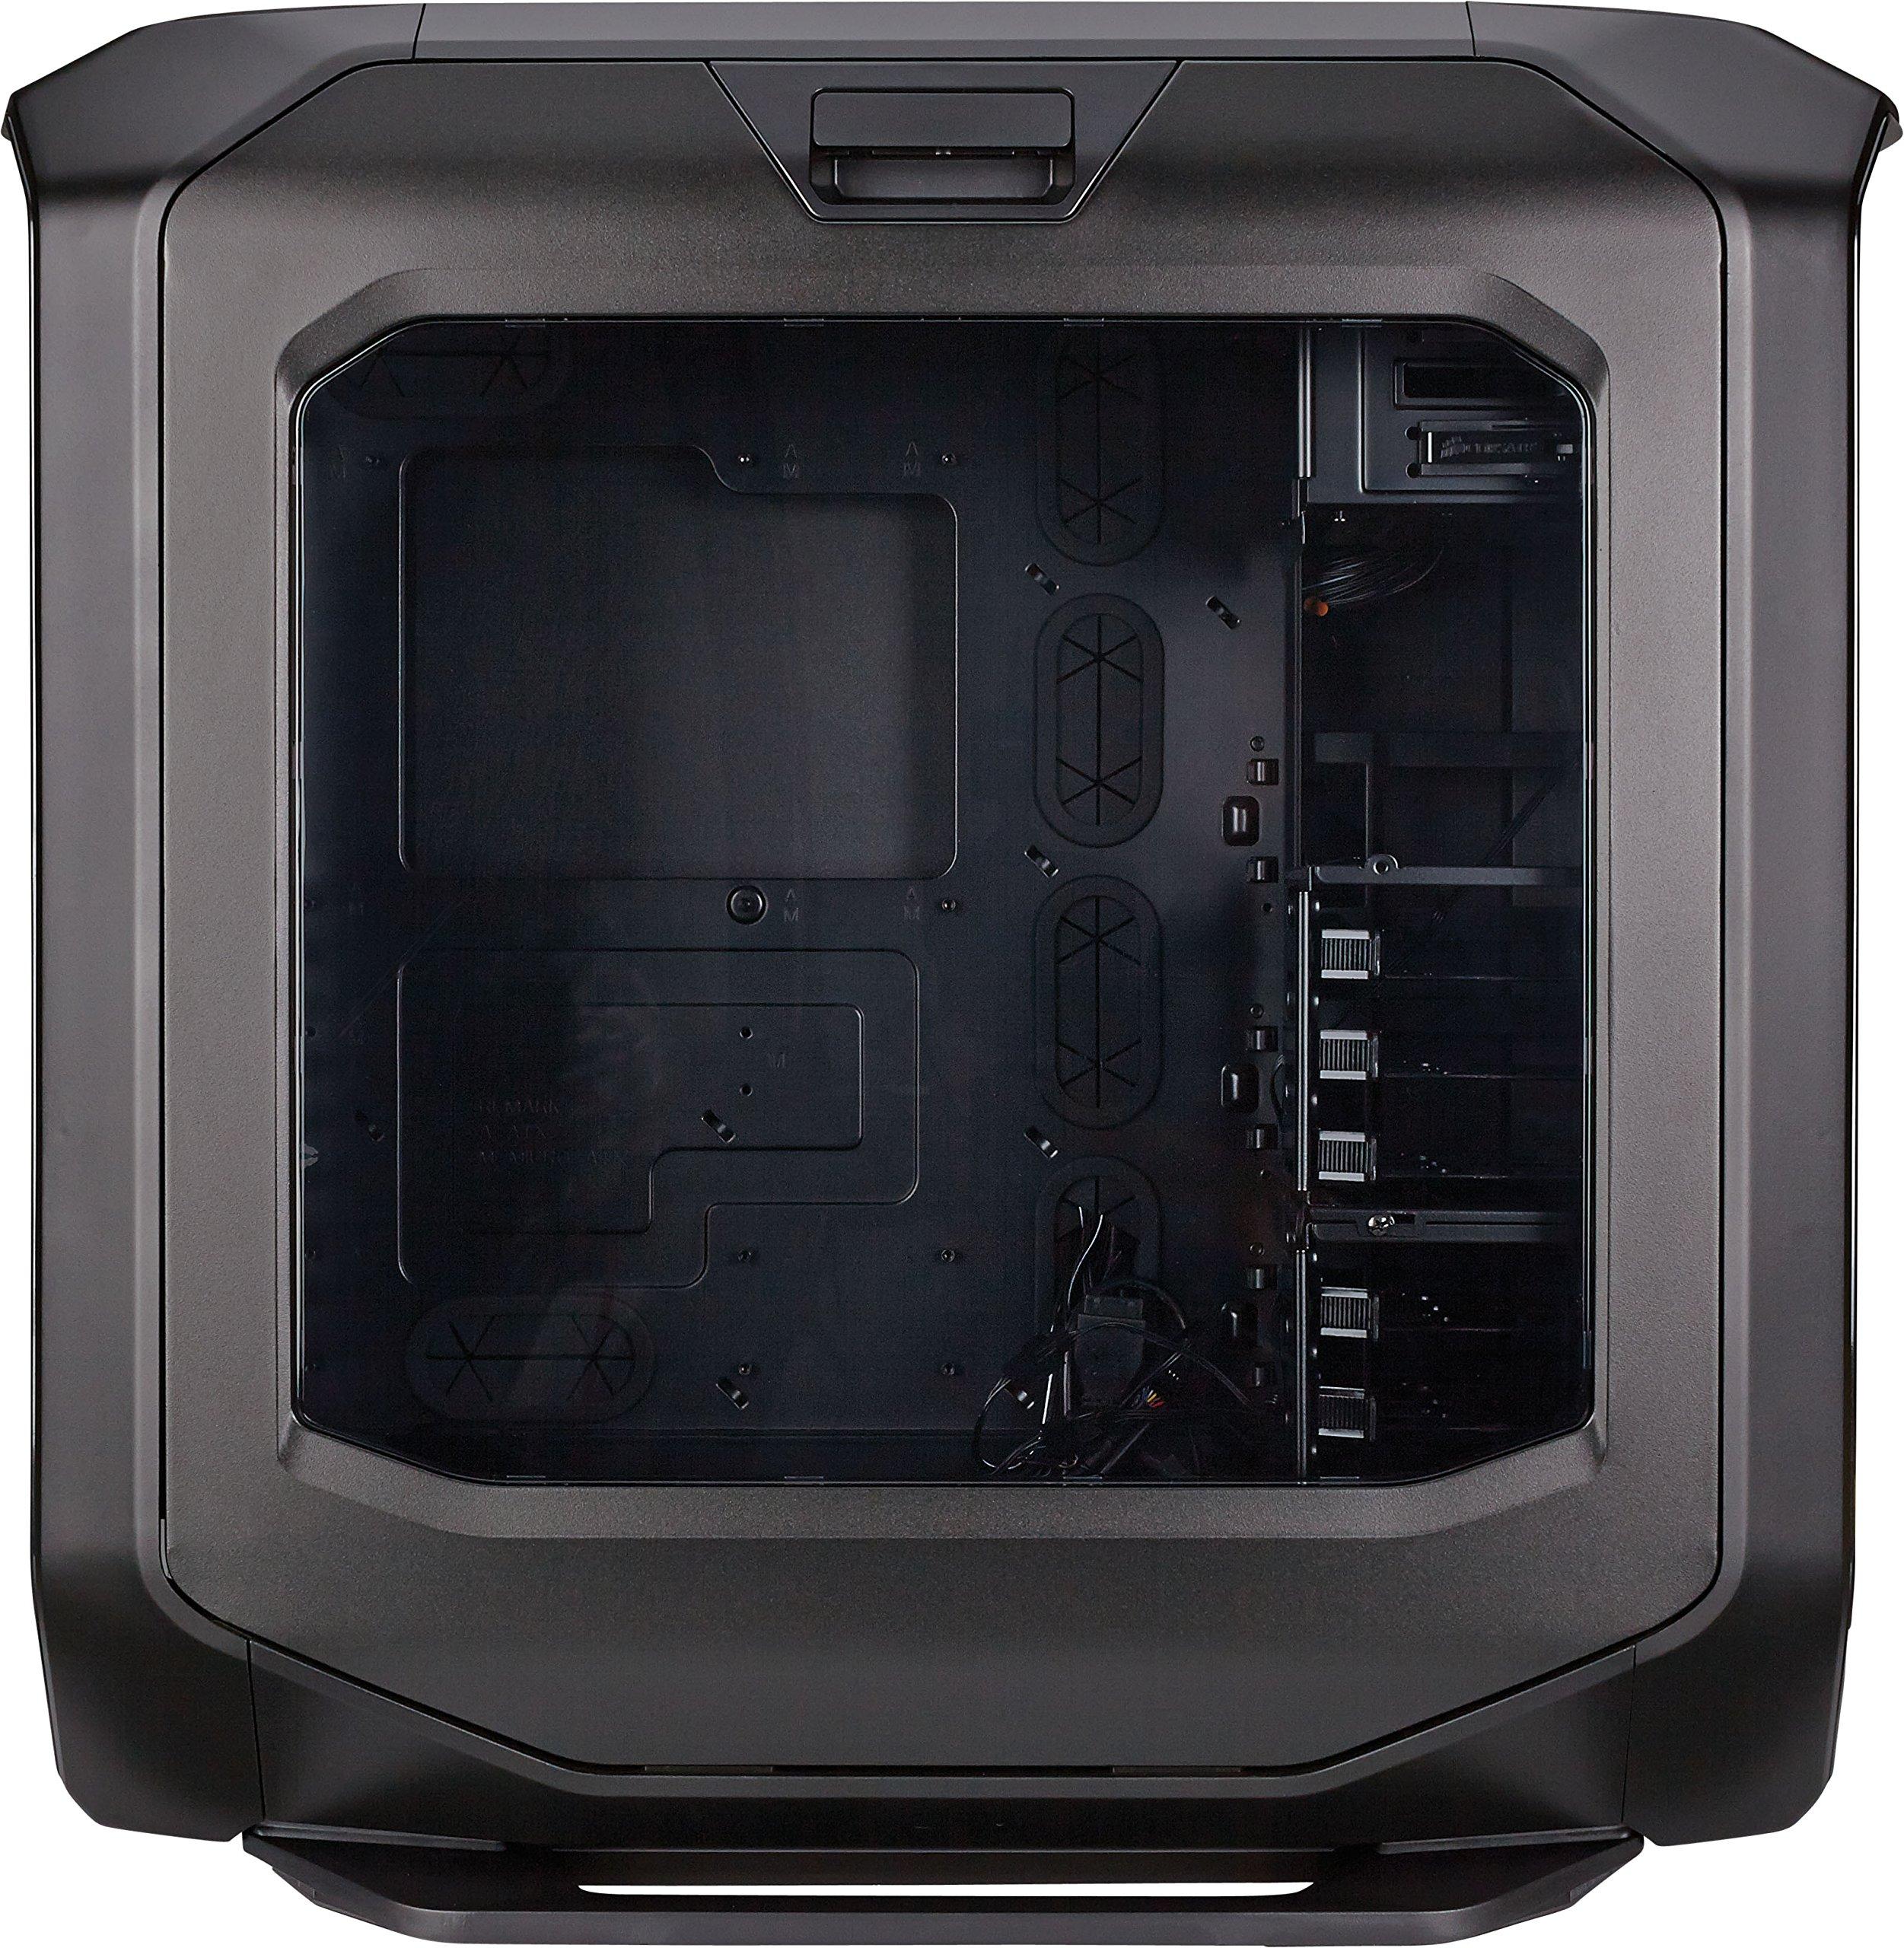 Corsair Graphite Series 780T Full Tower PC Case - Black by Corsair (Image #9)